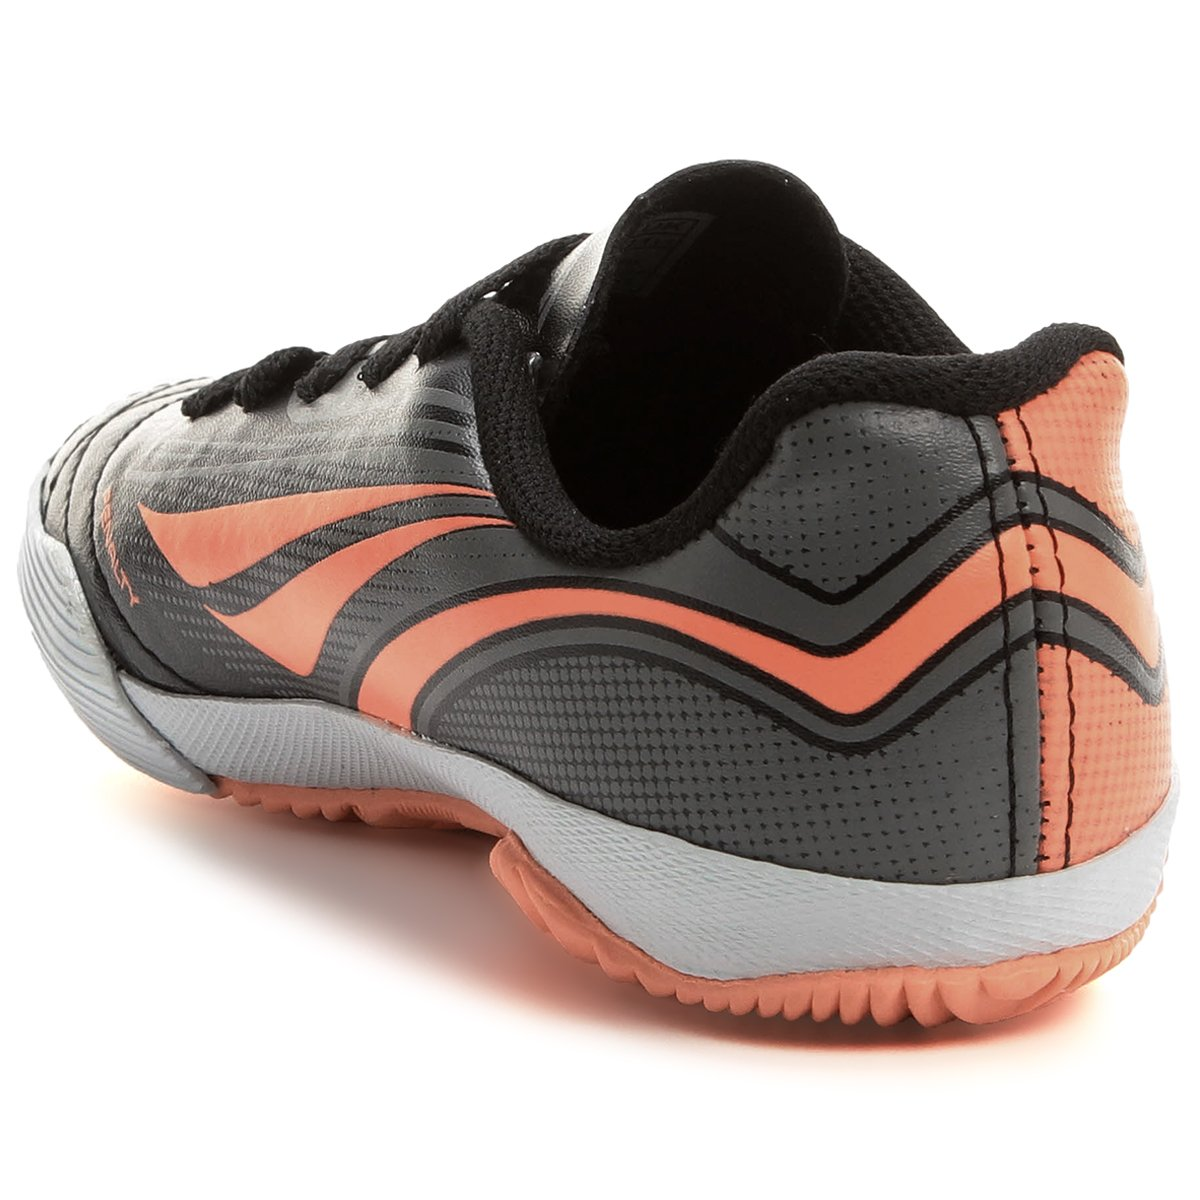 a875fba57a Chuteira Futsal Infantil Penalty ATF Rocket 6 - Compre Agora